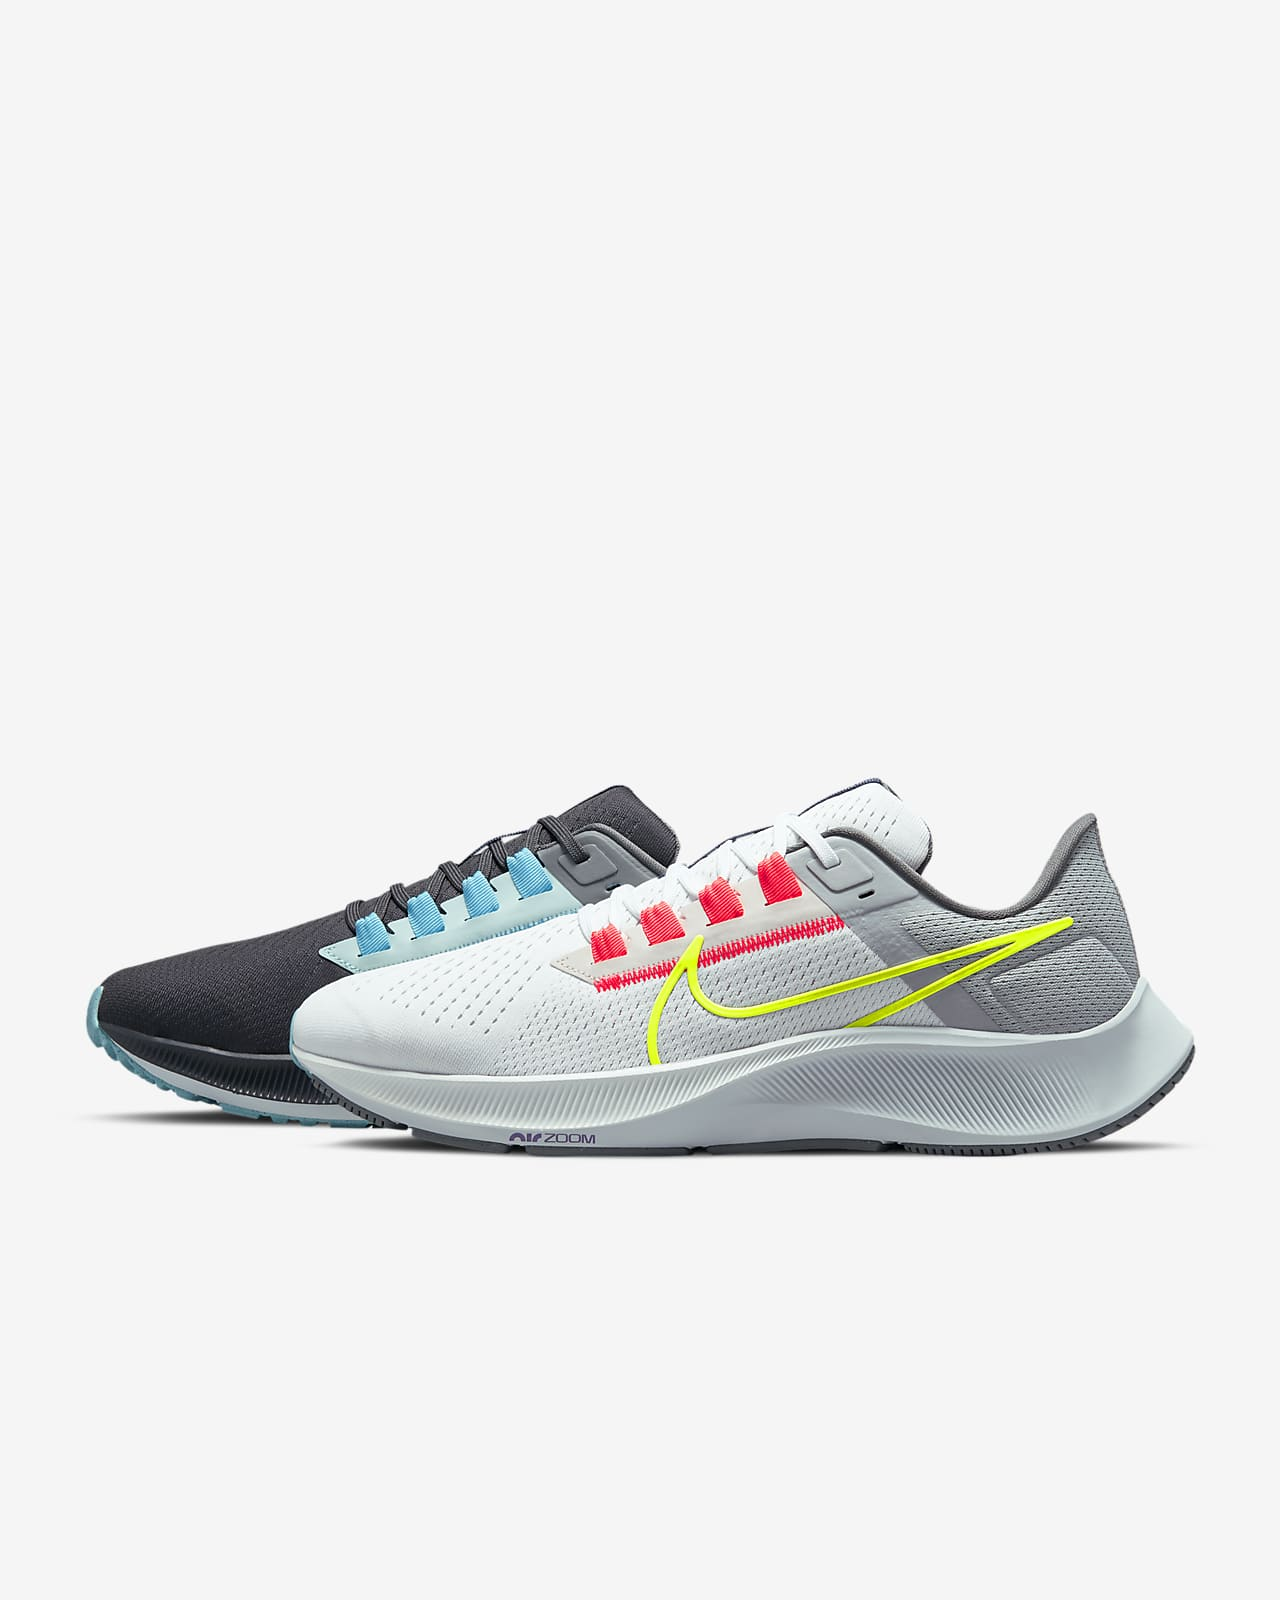 Sapatilhas de running Nike Air Zoom Pegasus 38 Limited Edition para homem